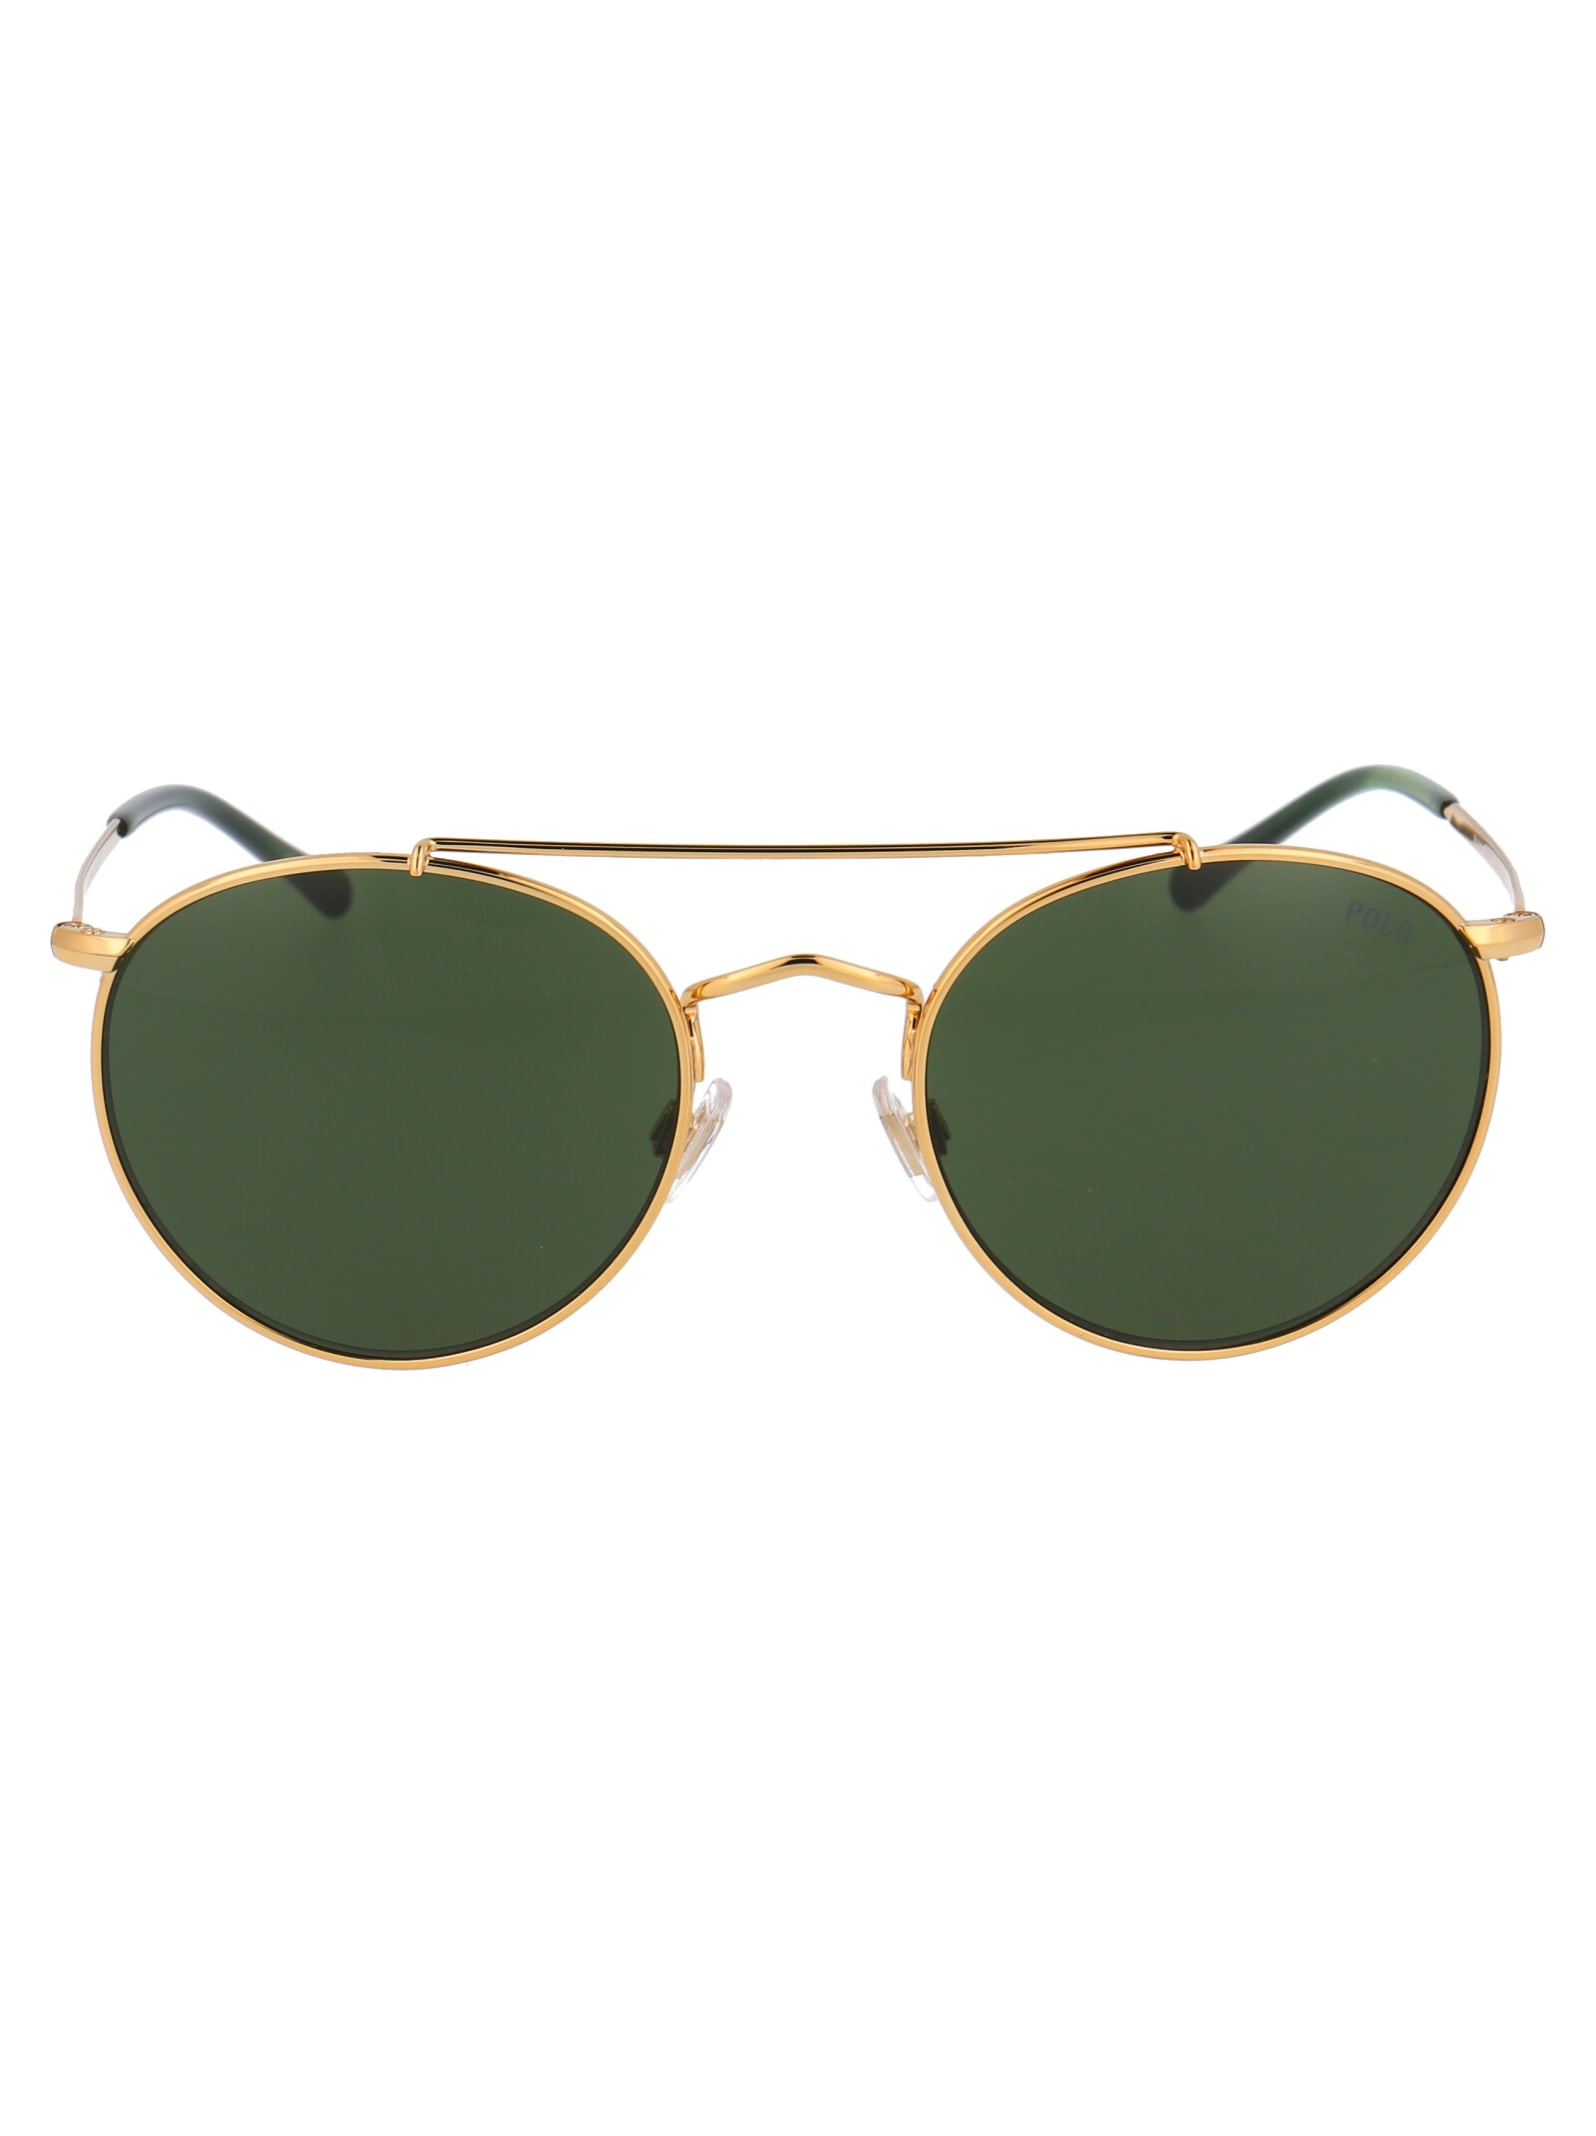 0ph3114 Sunglasses